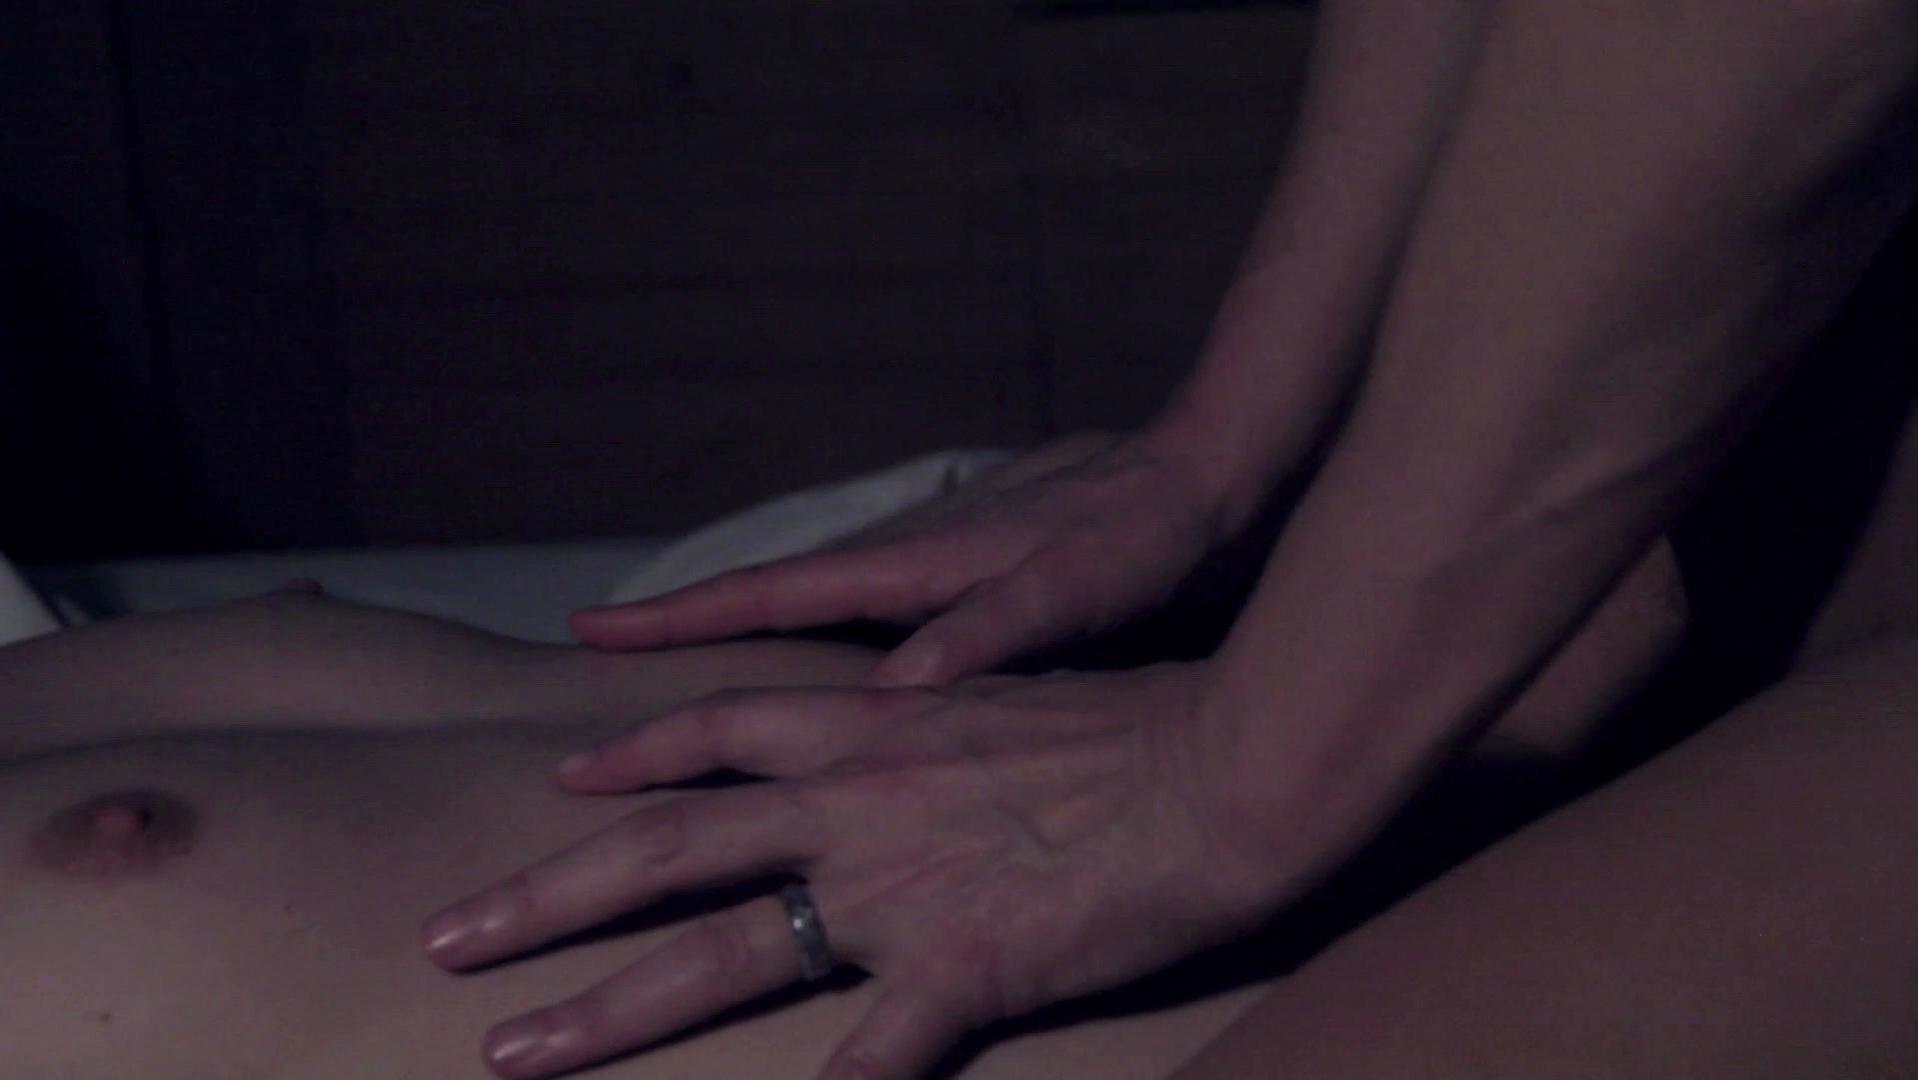 448 aurelie houguenade 2014 lesbian scenes - 1 part 6